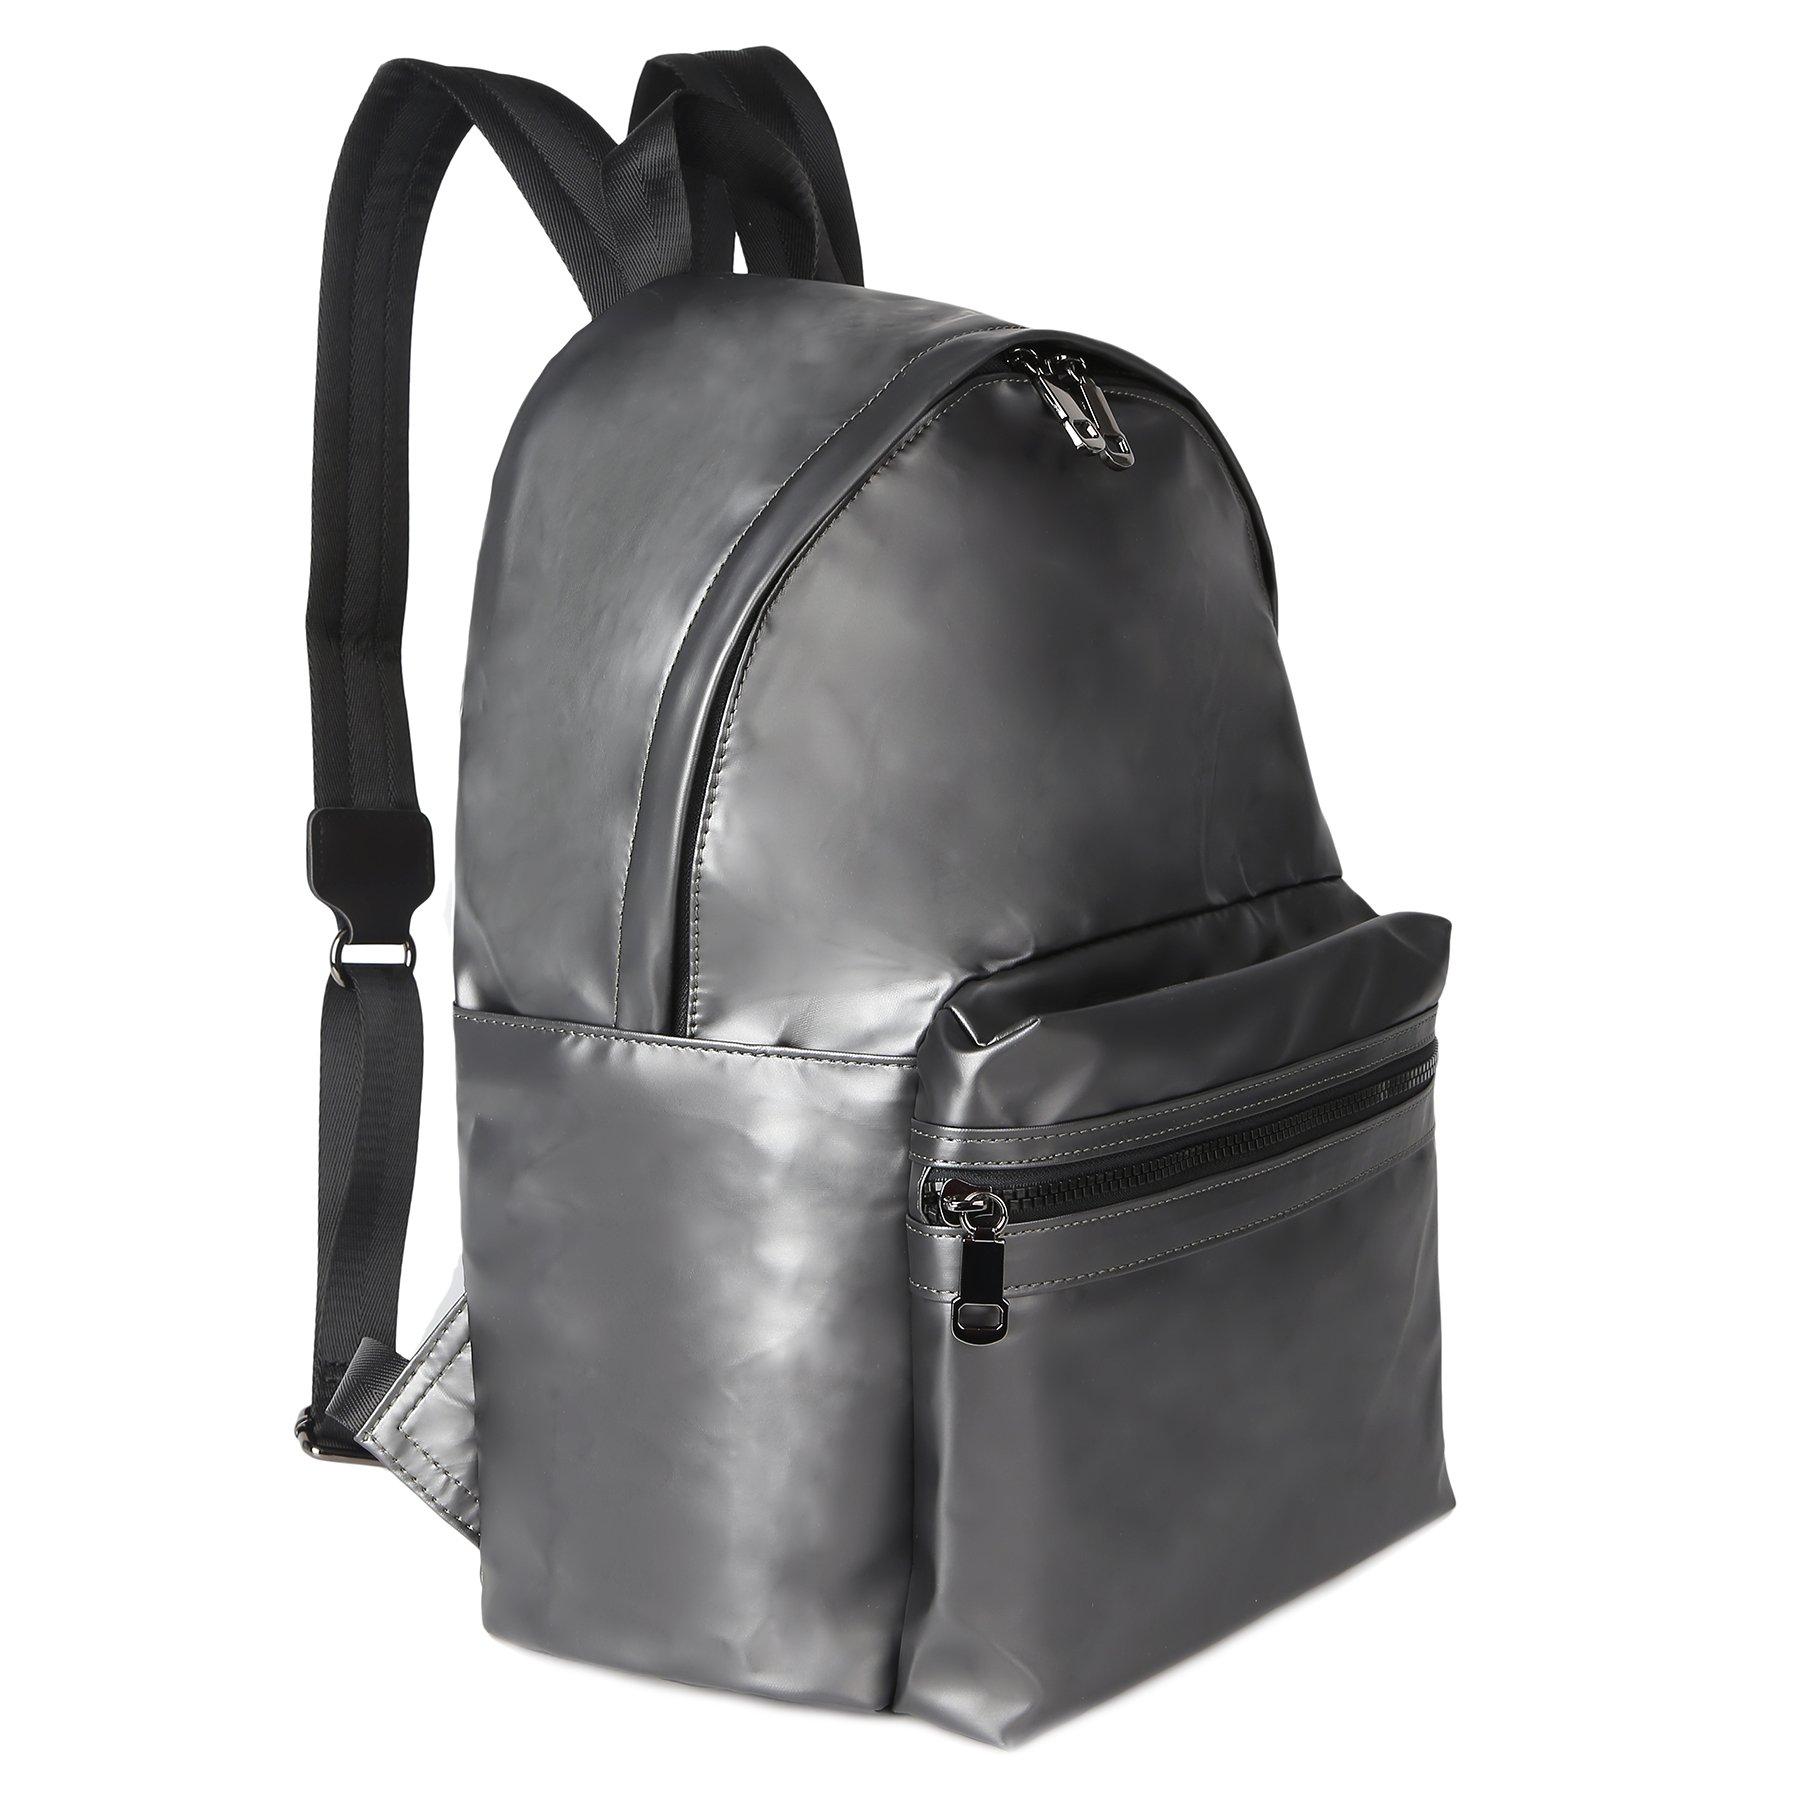 ZORFIN Fashion Nylon Backpack for Women&Men Rucksack Purse School Bags for Girls Waterproof Book Bag